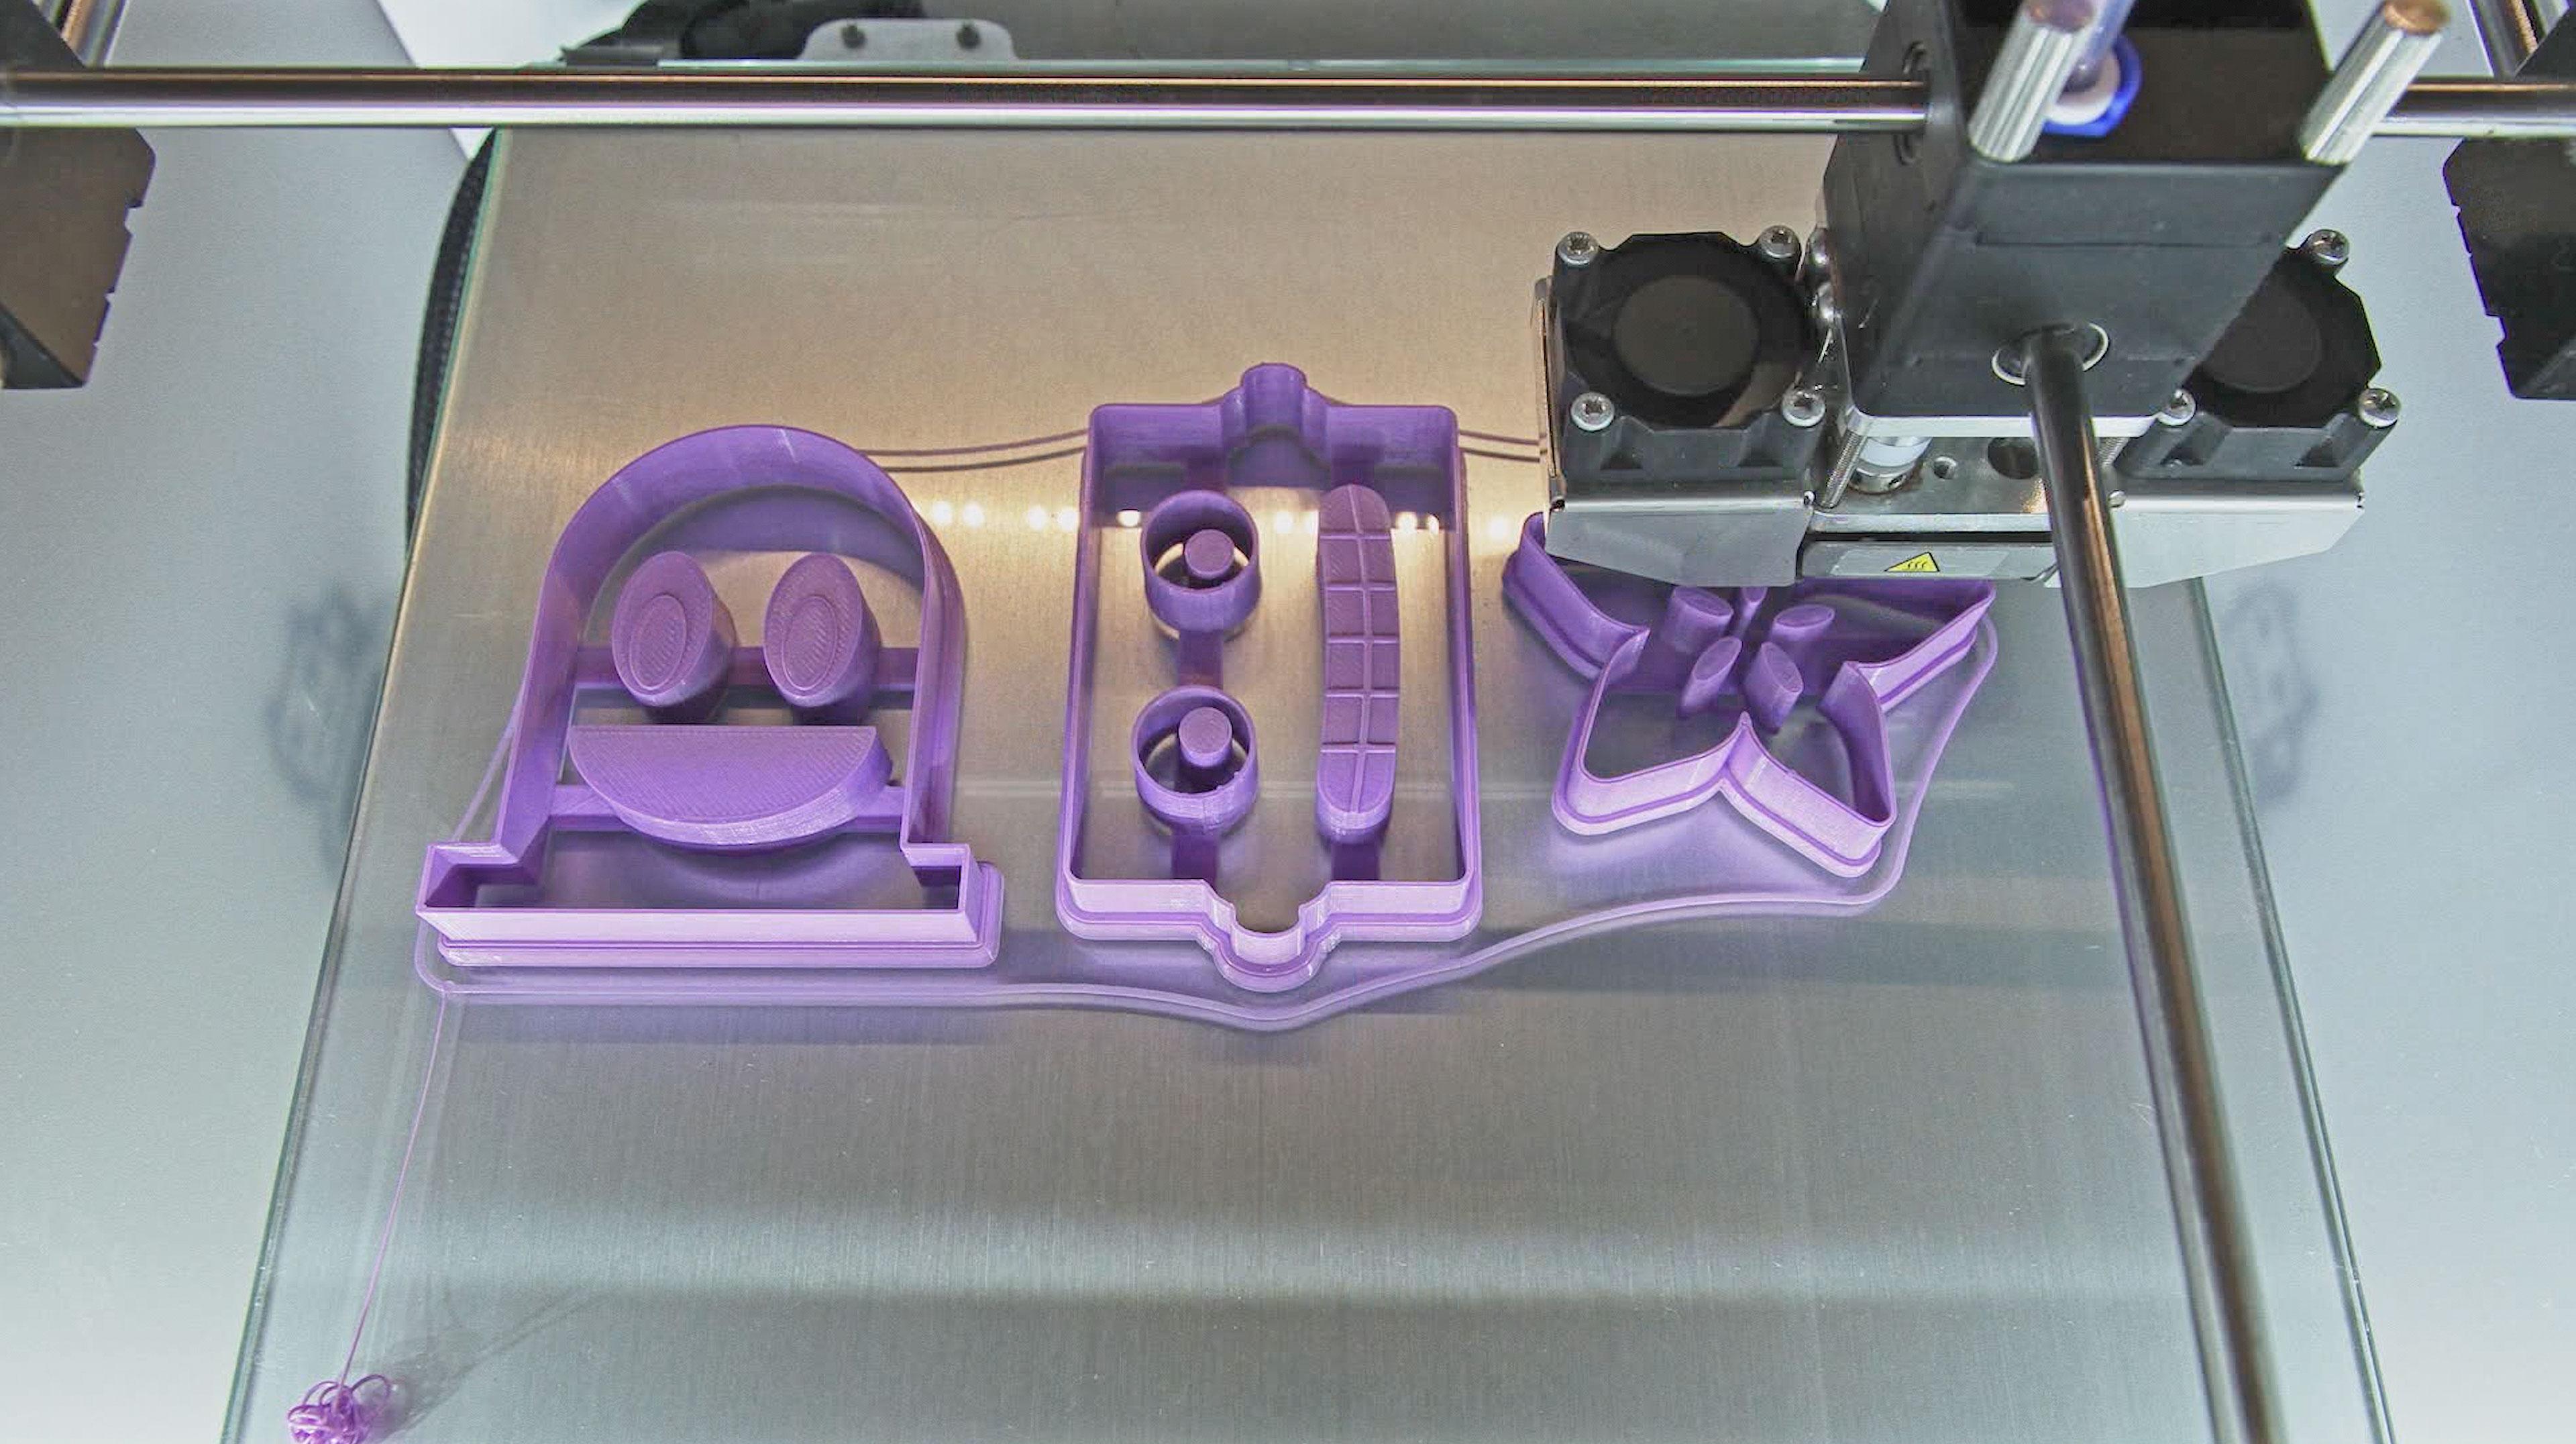 3d_printing_printing-cutters.jpg